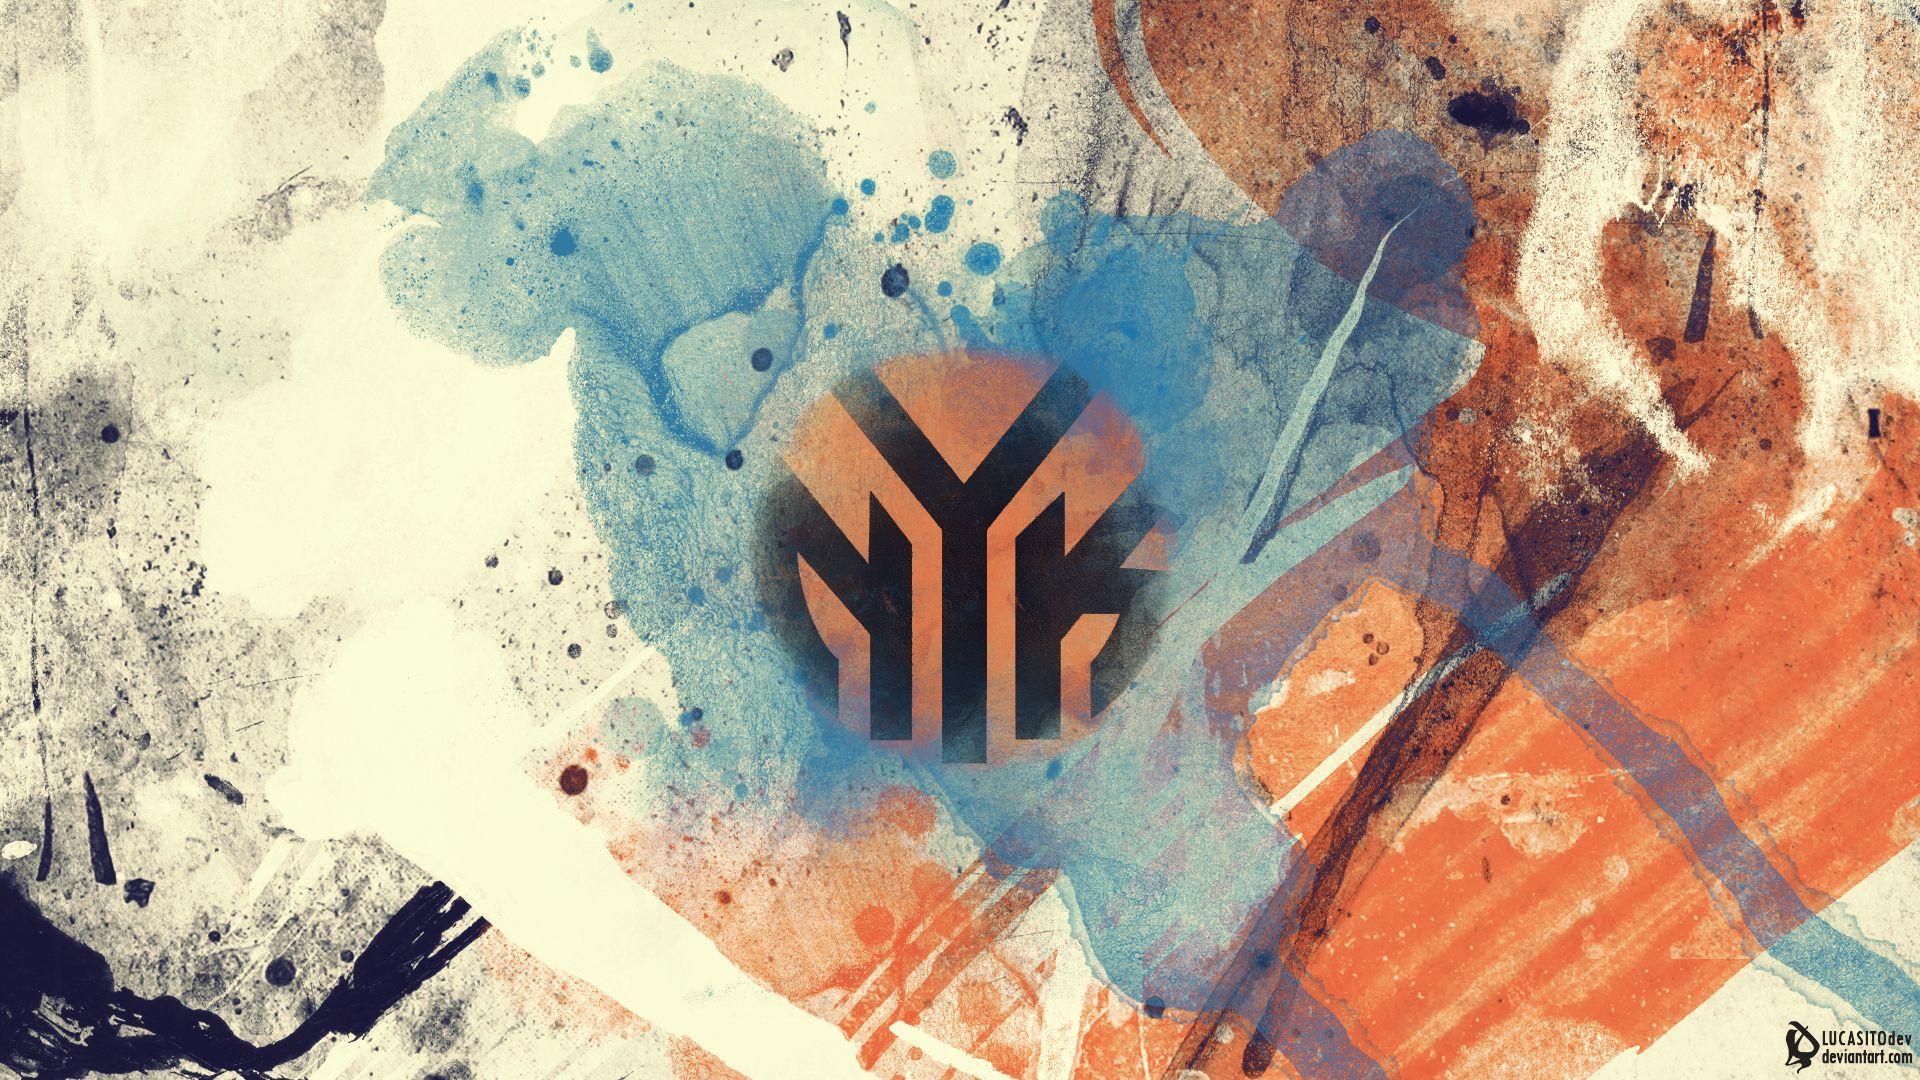 New York Knicks hd wallpaper 1080